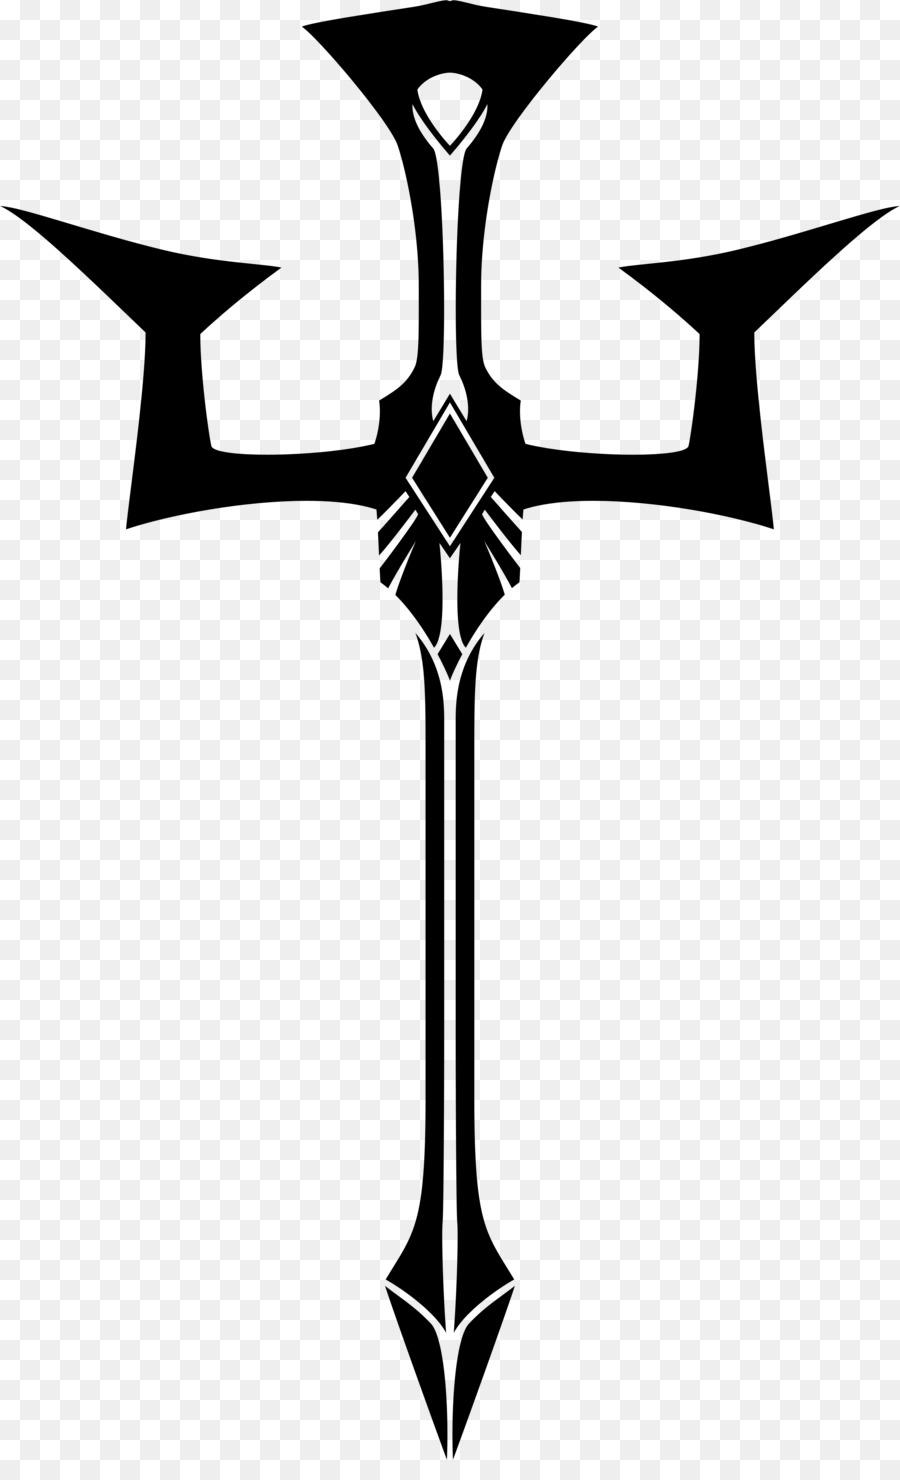 Crusades Diablo Iii Reaper Of Souls Symbol Heroes Of The Storm Sign